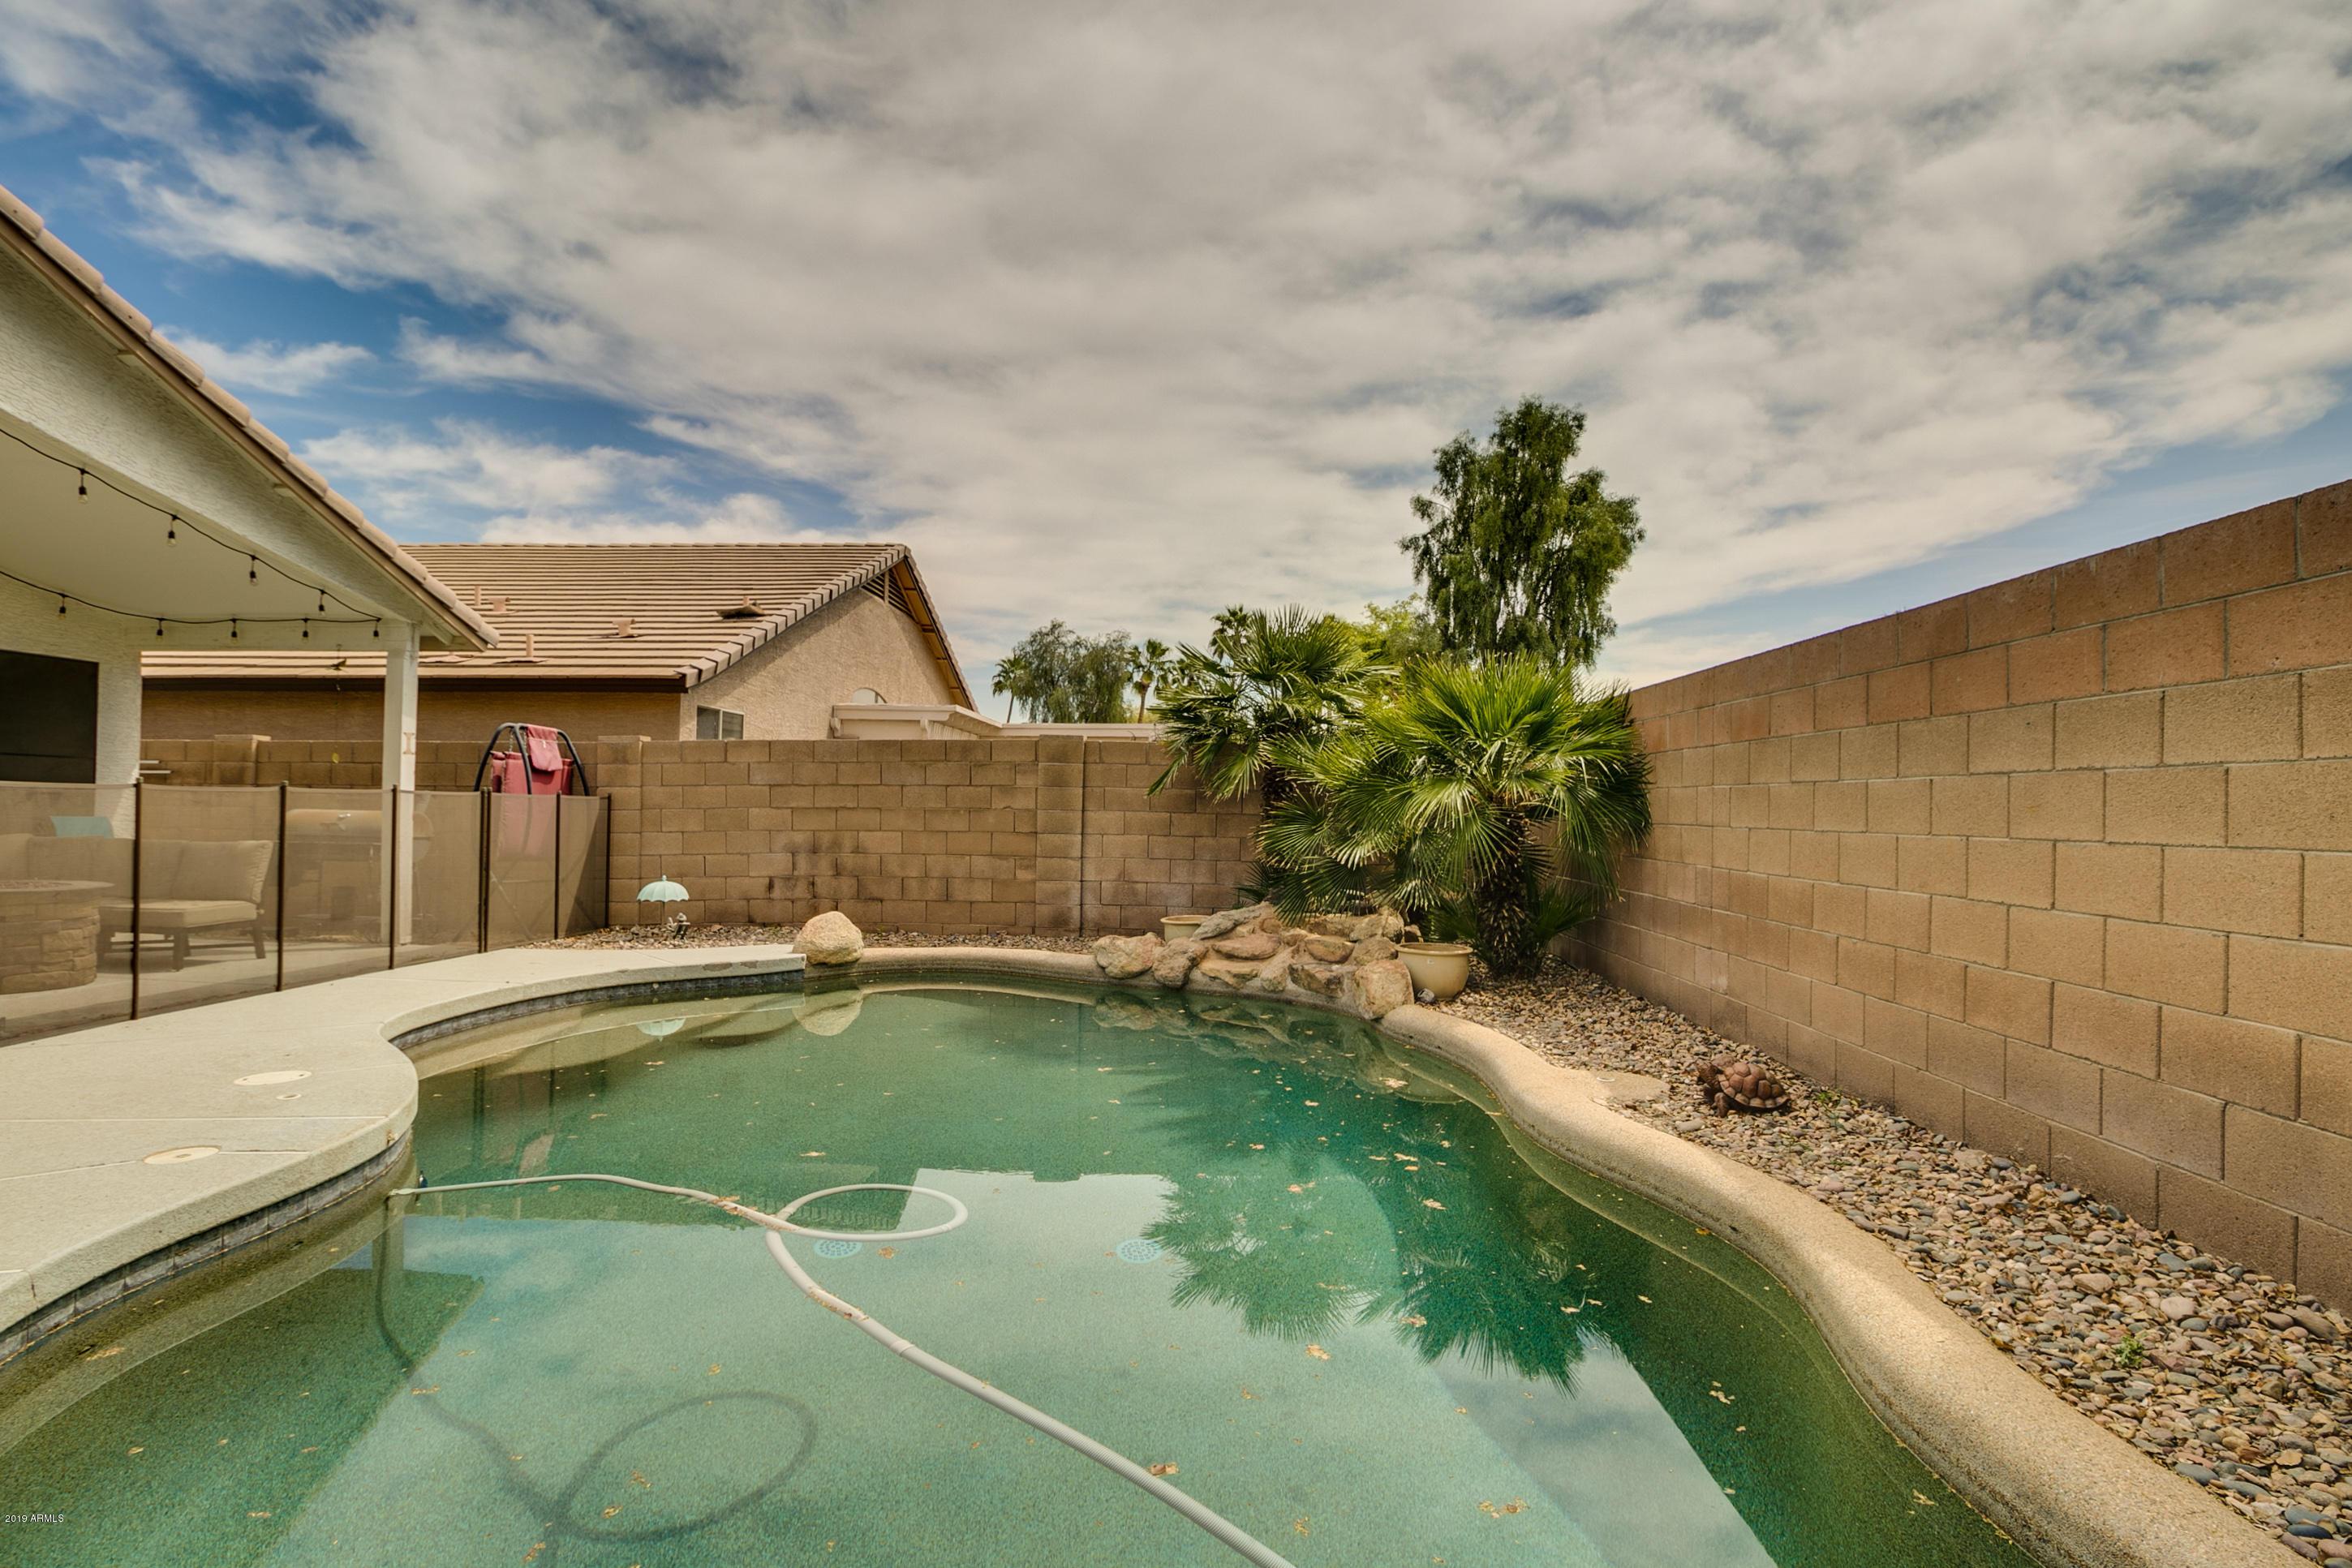 MLS 5909227 12863 W LEWIS Avenue, Avondale, AZ 85392 Avondale AZ Three Bedroom